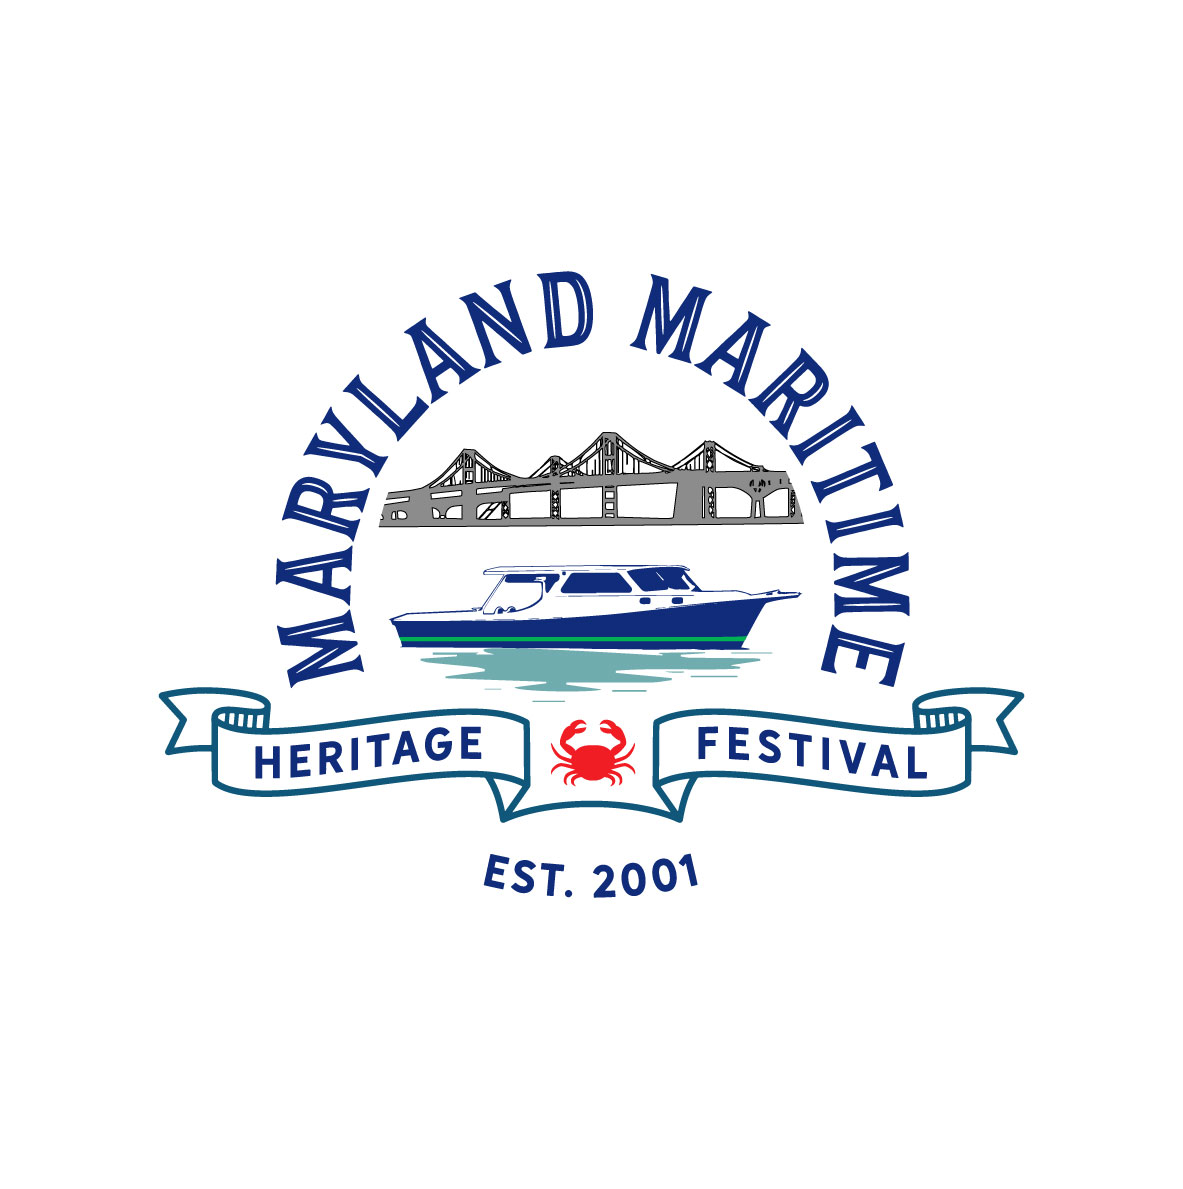 Maryland Maritime Heritage Club